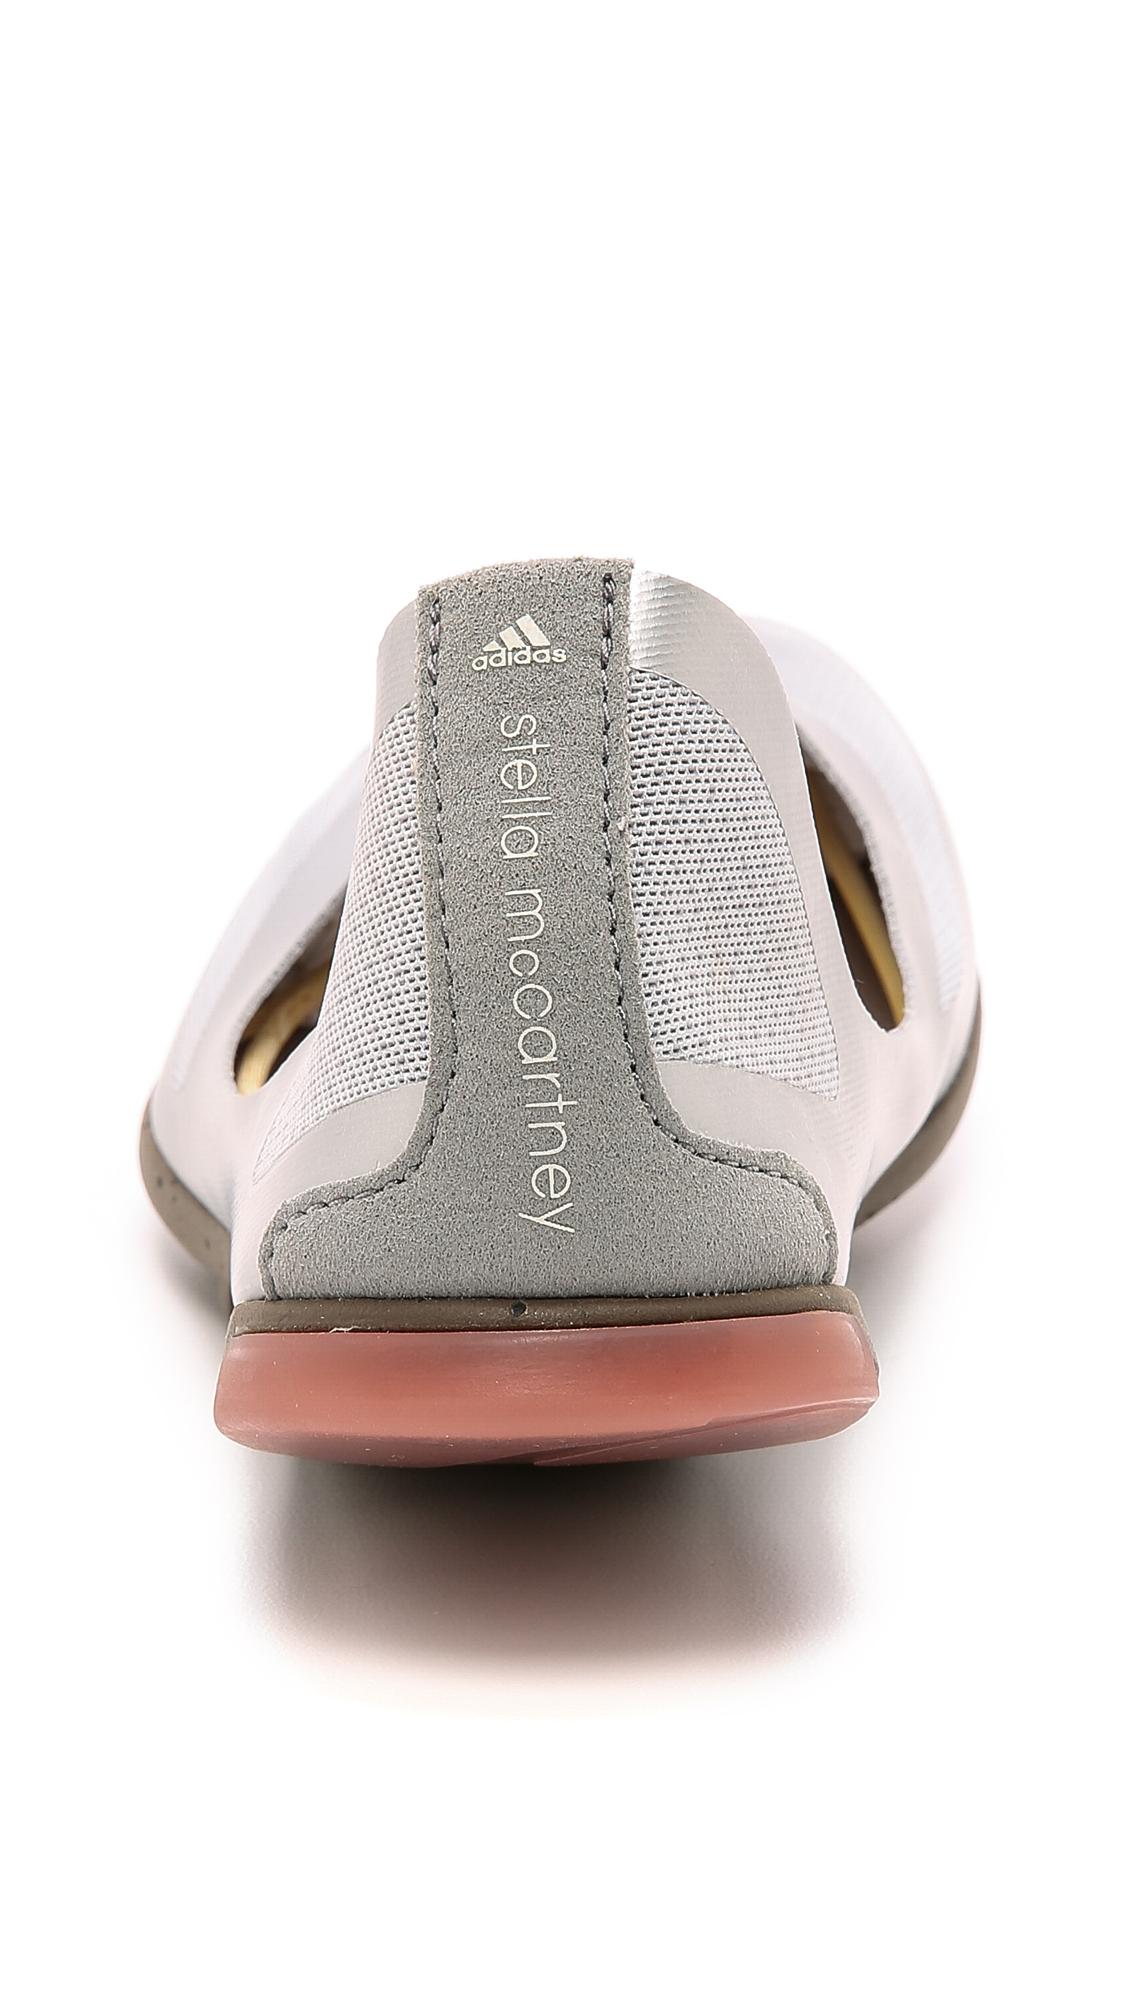 Lyst Adidas Da Stella Mccartney Opaca Ciccura Le Ballerine Opaca Mccartney 00cc56